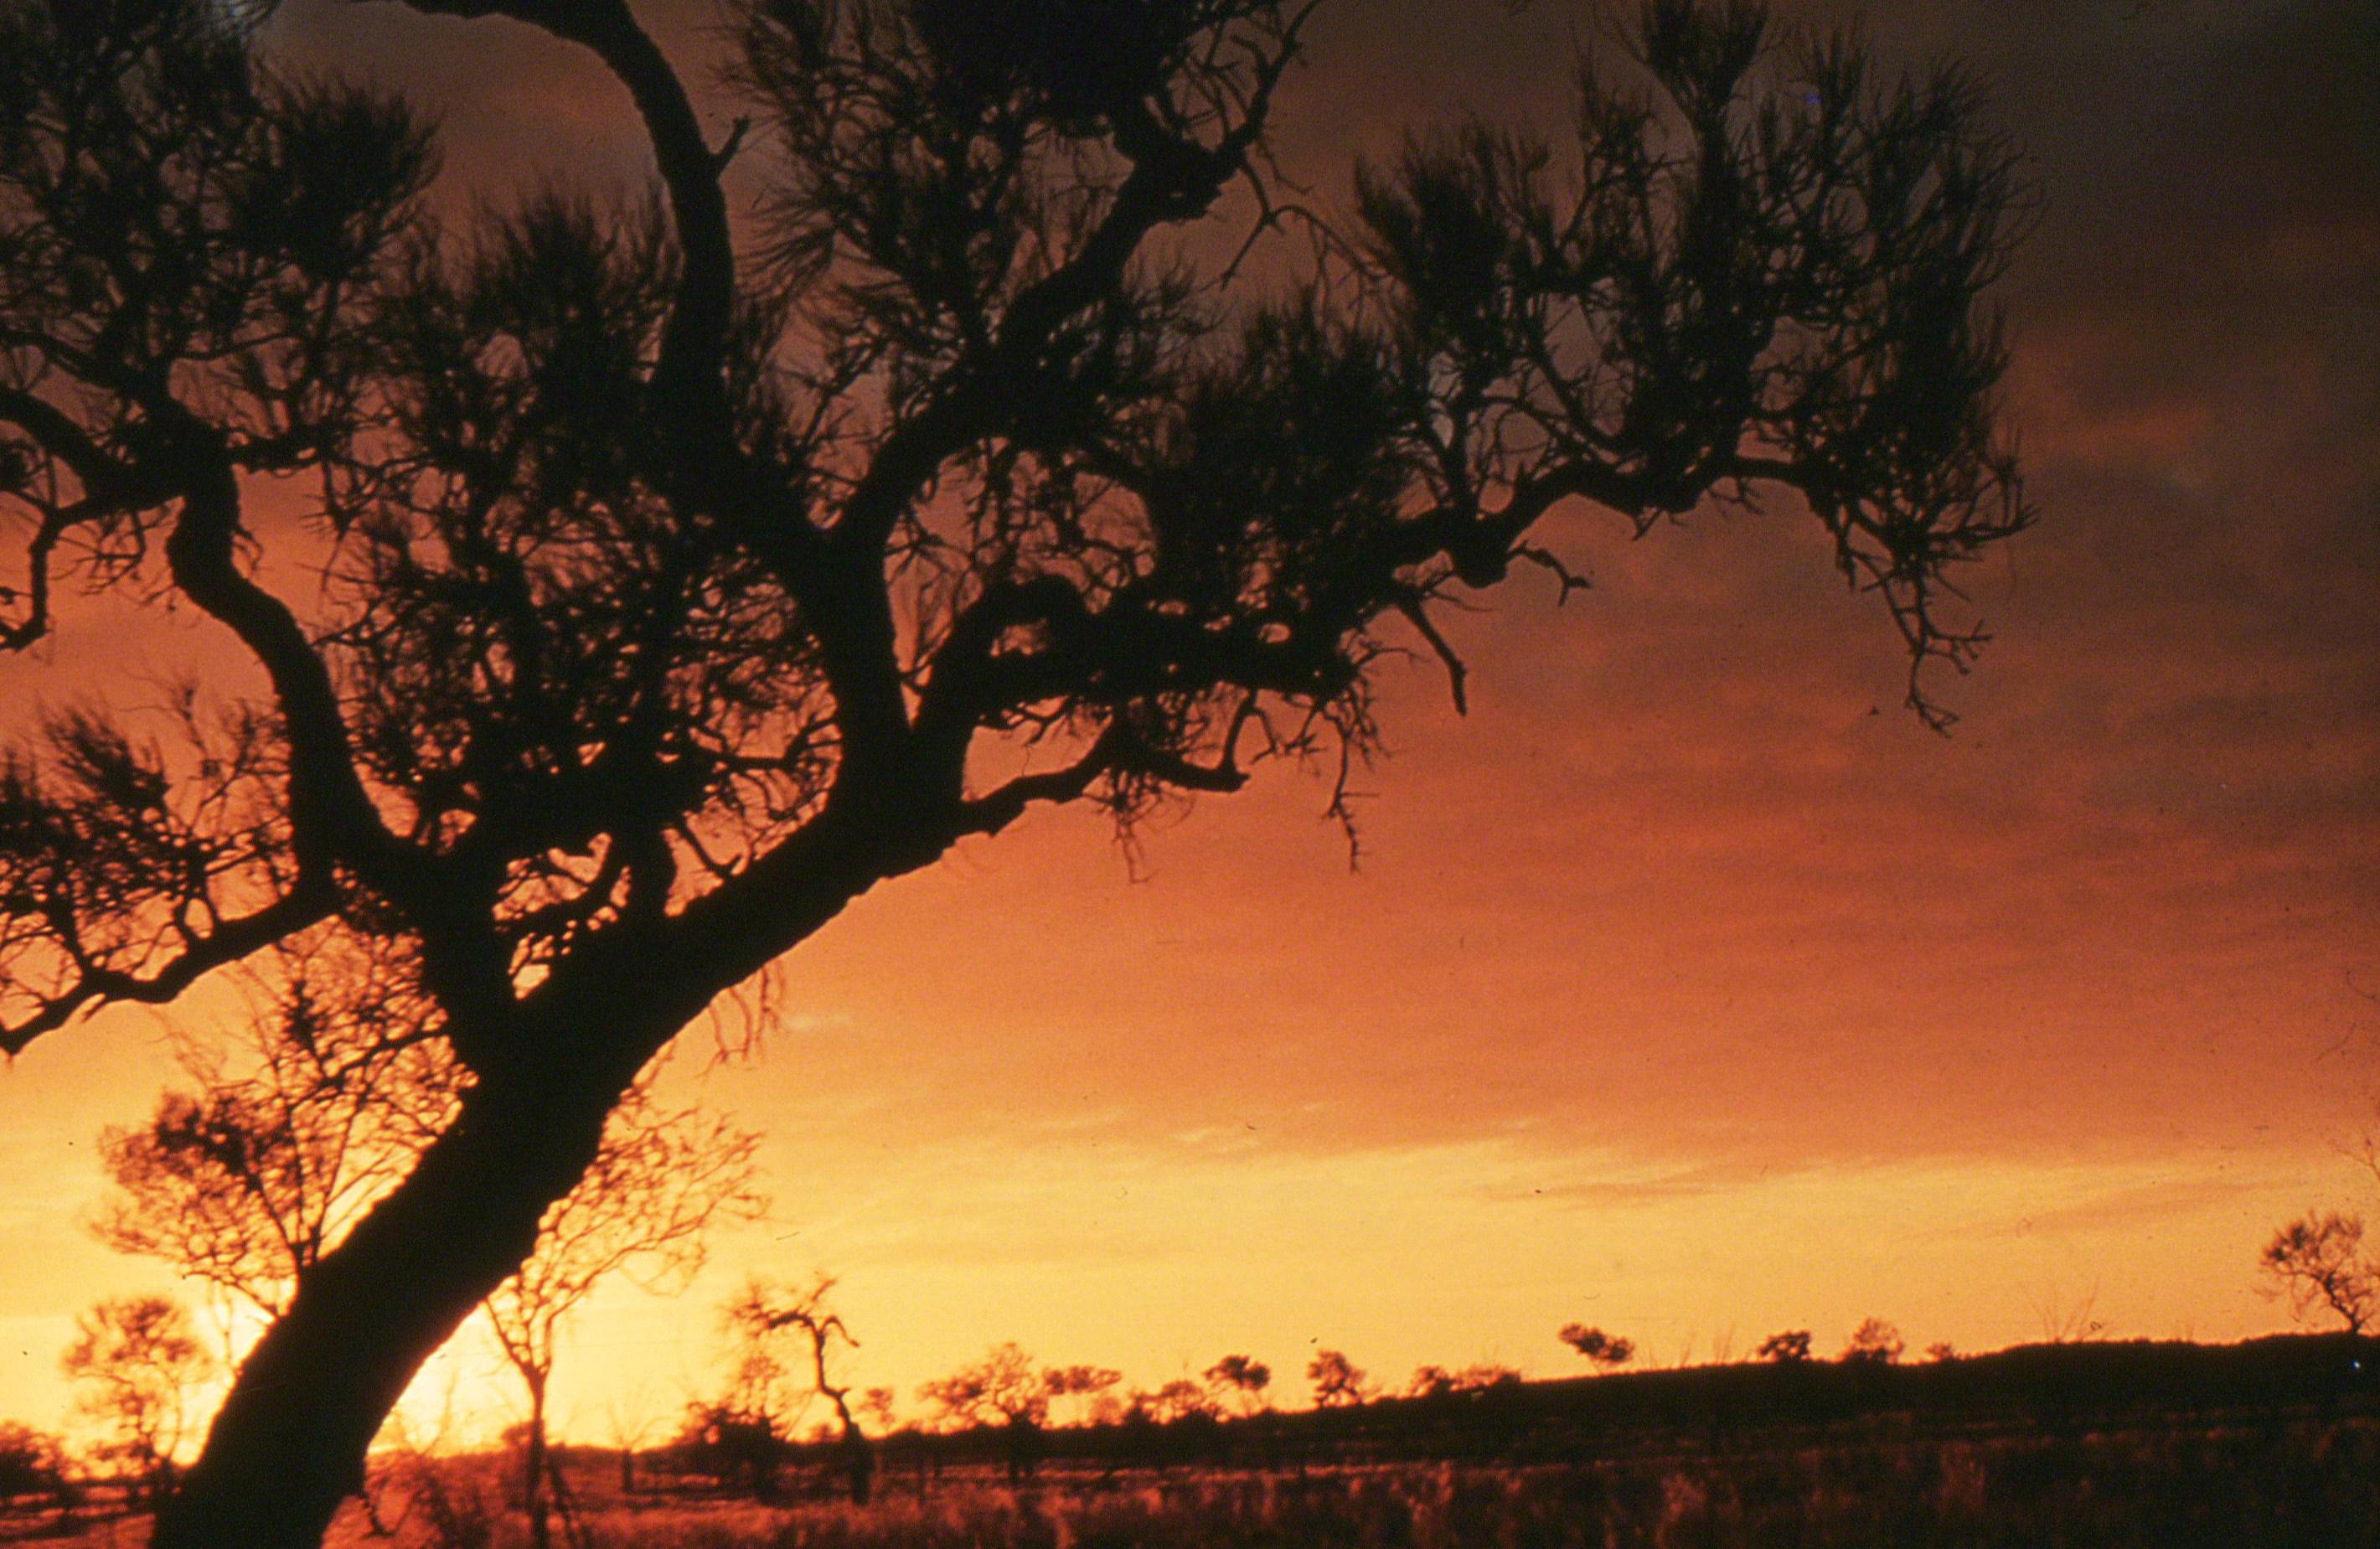 Sams032-sunset